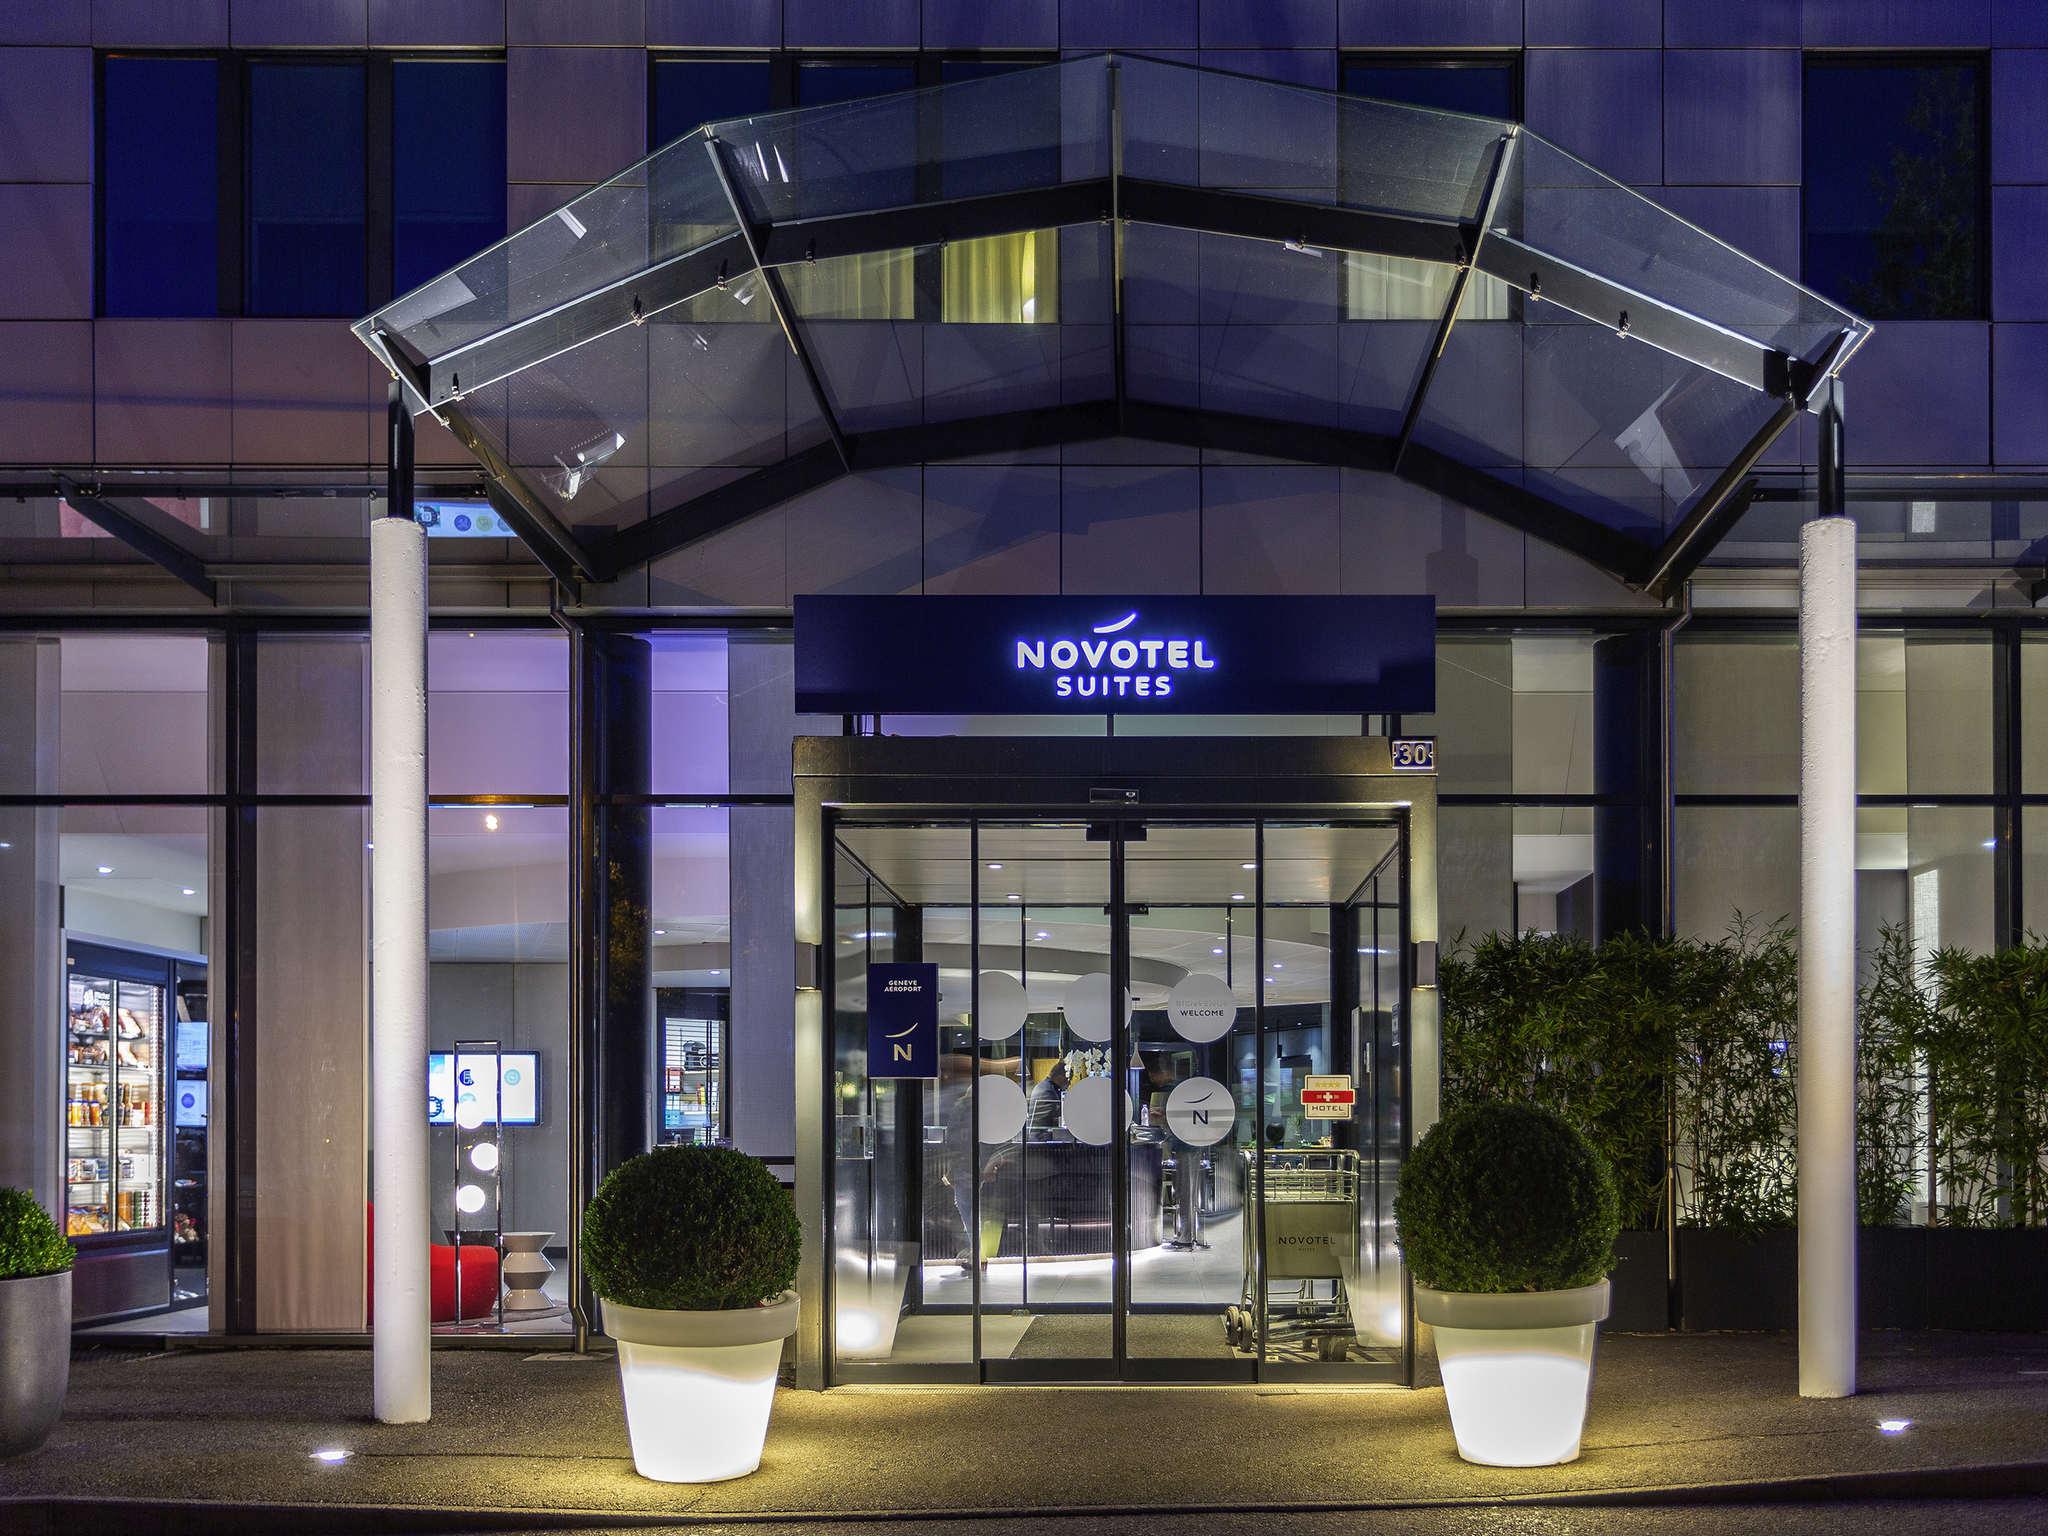 Hotel - Novotel Suites Geneve Aeroport